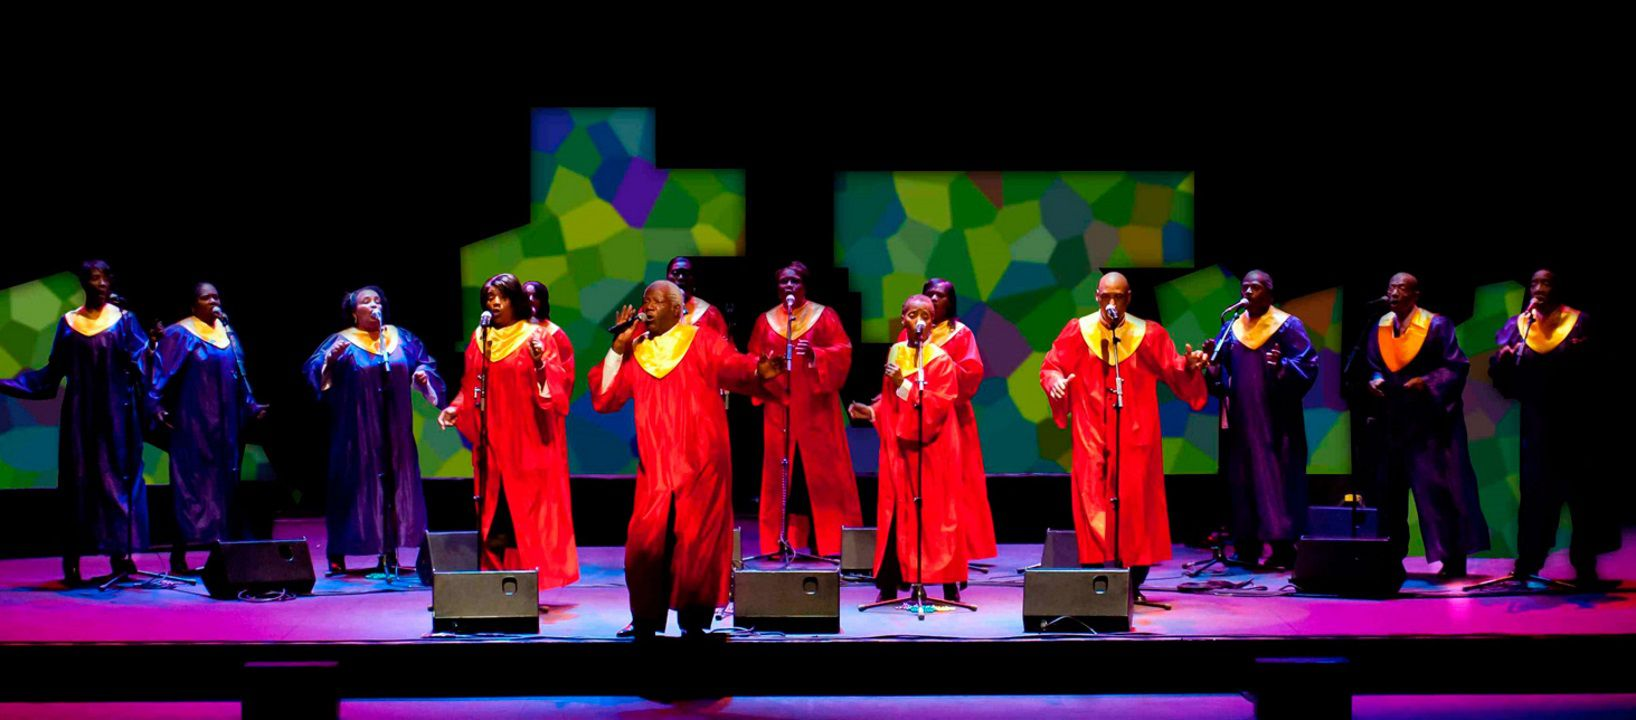 El Spirit of New Orleans Gospel Choir actuará en Vigo y Pontevedra